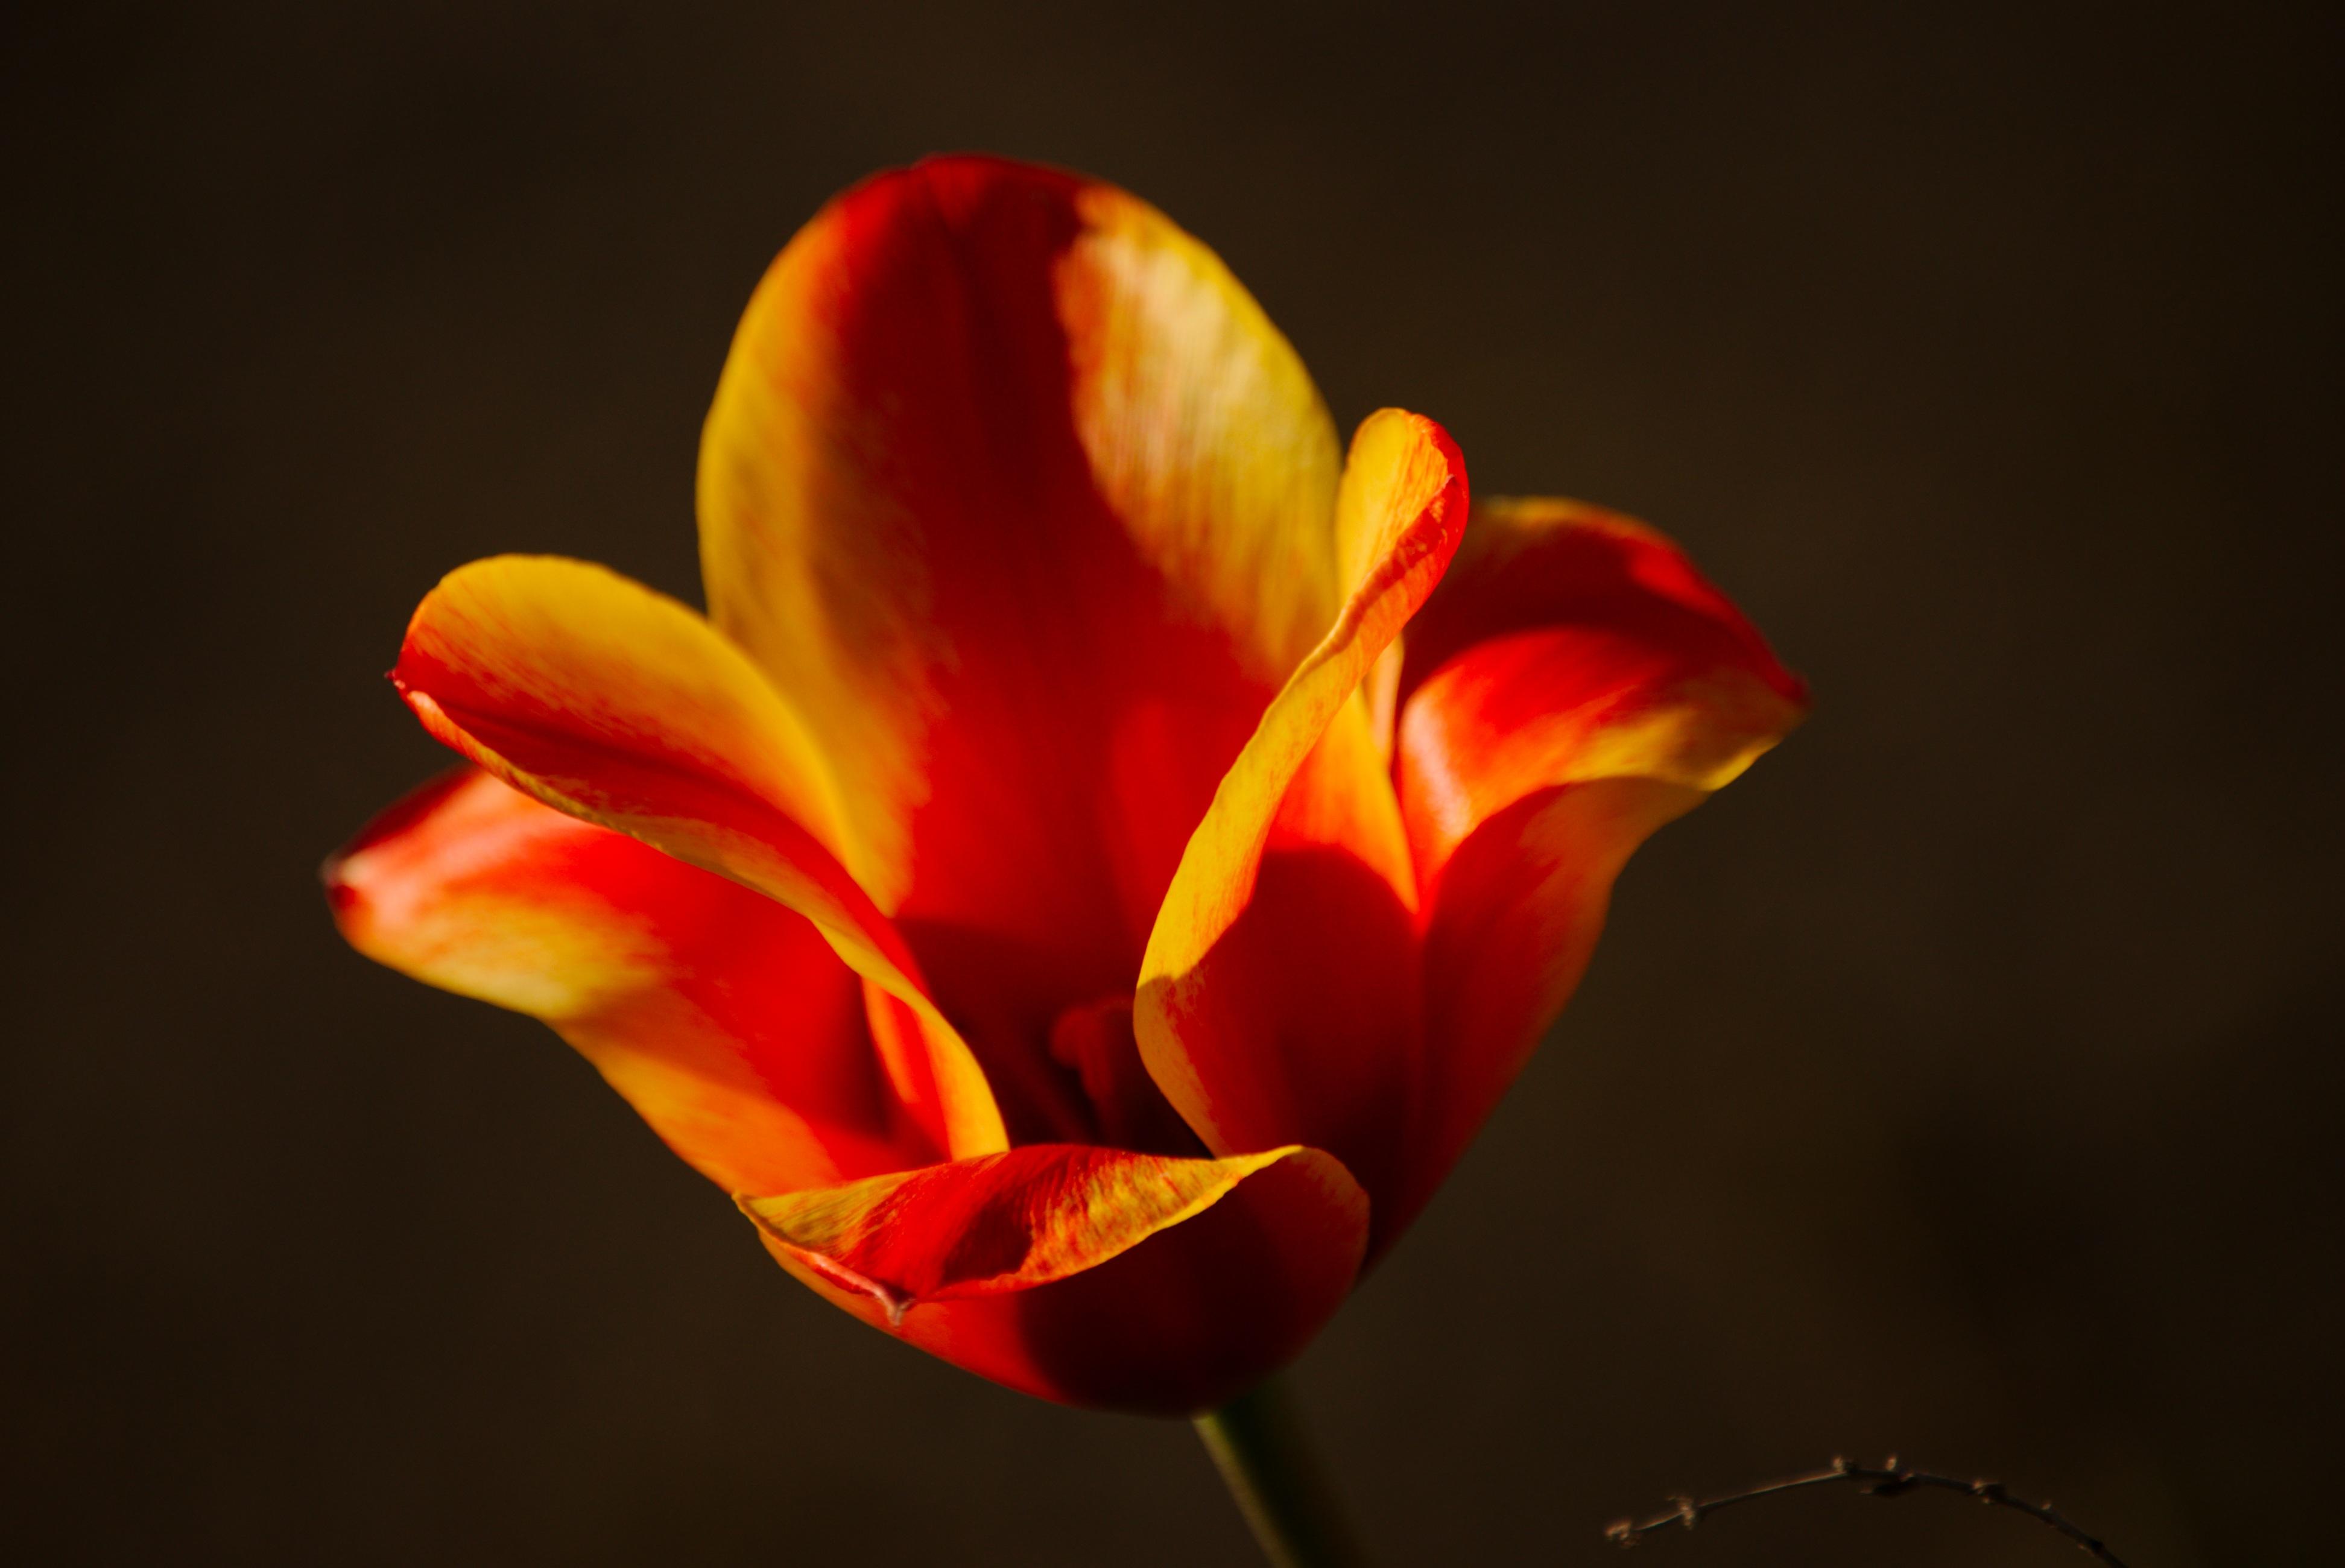 free images landscape nature blossom sun sunlight petal